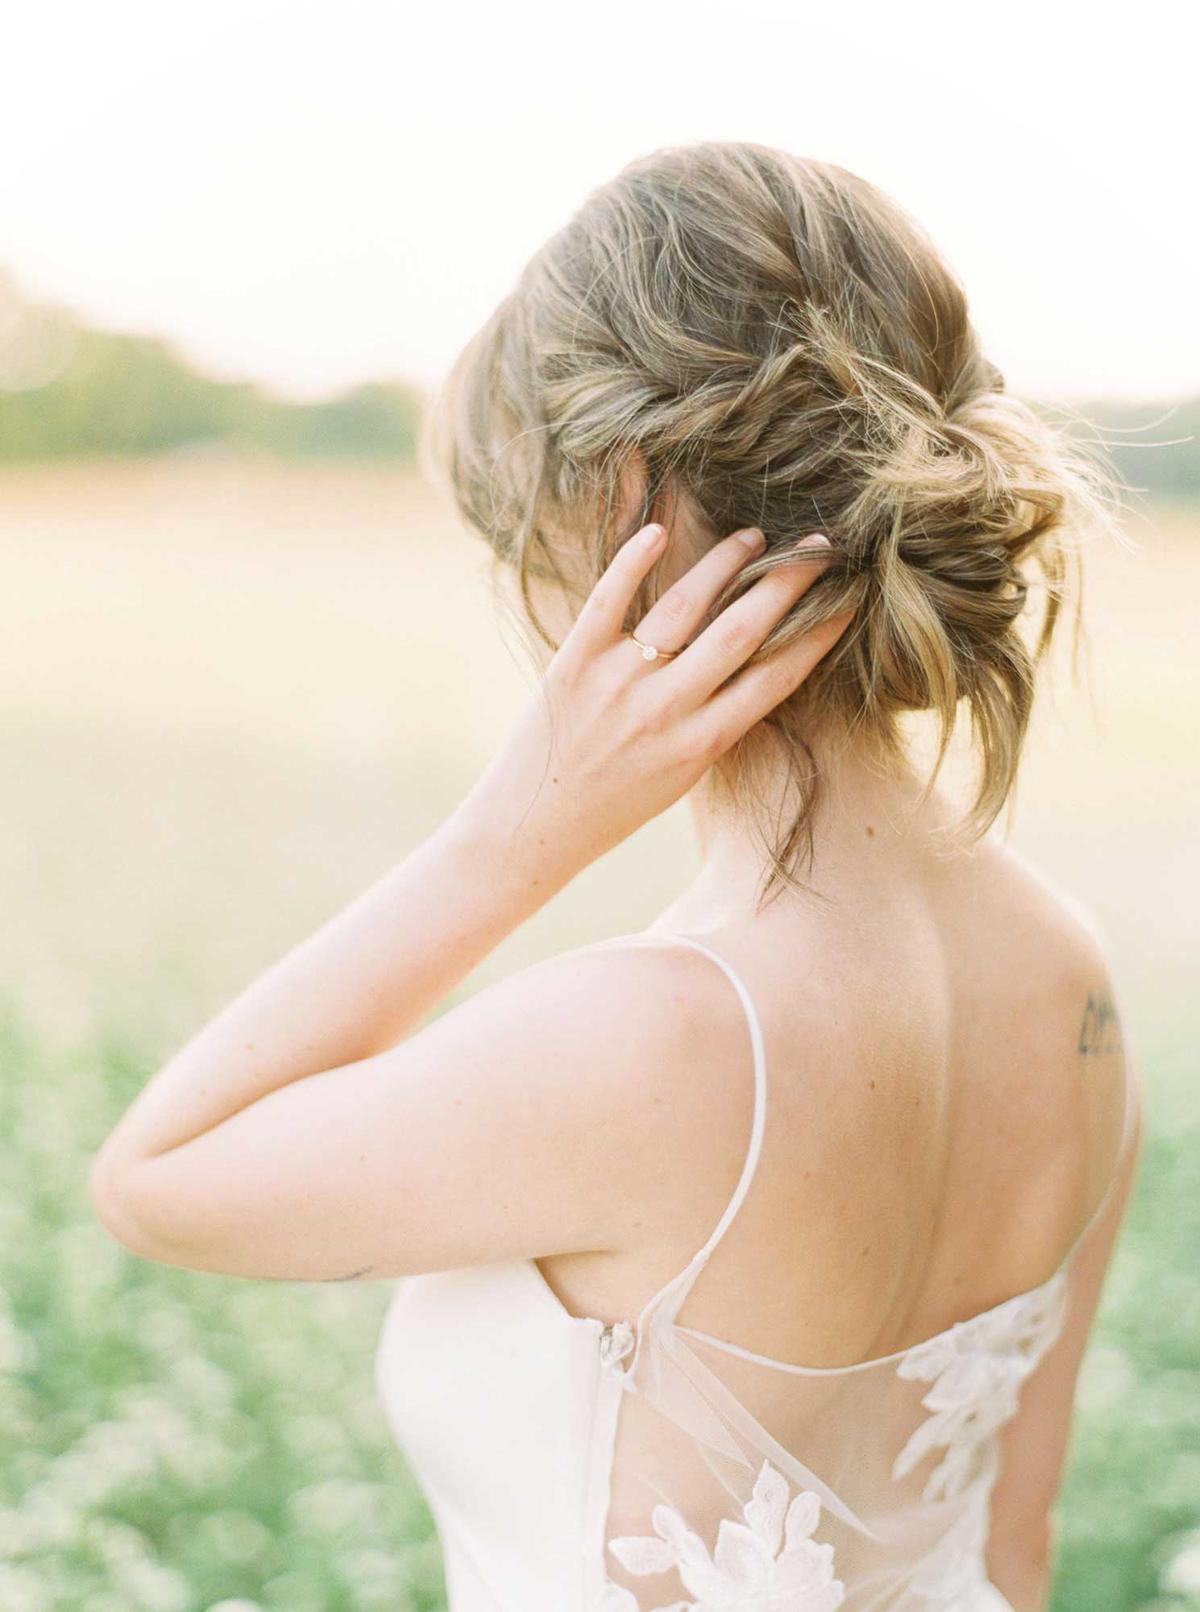 kayla-yestal-vineyard-bride-swish-list-woodland-weddings-niagara-wedding-editorial-23.jpg